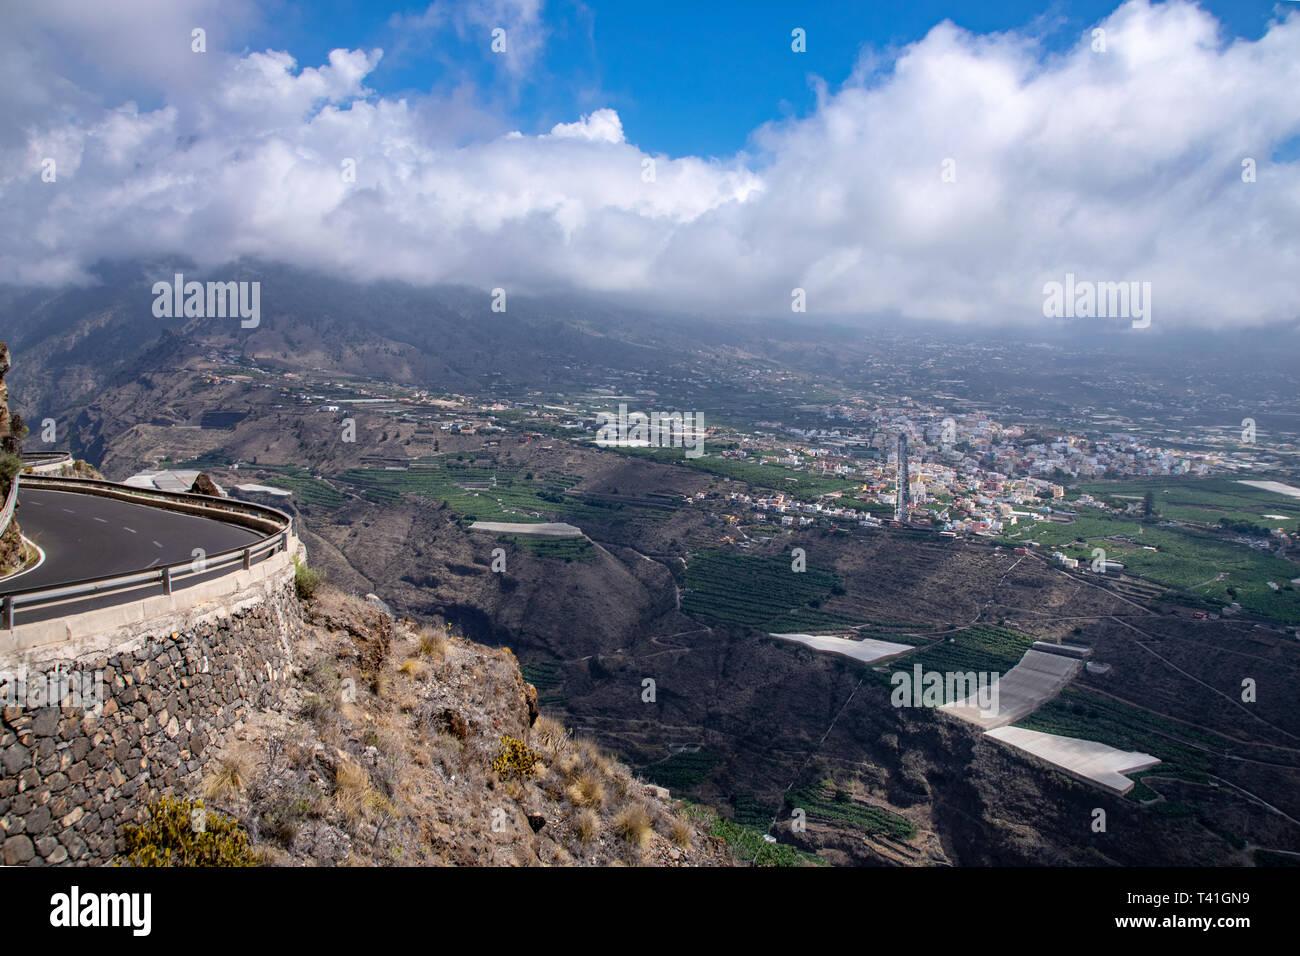 Panaromic view of Los Llanos and Tazacorte from Mirador El Time, La Palma, Canary Islands, Spain Stock Photo